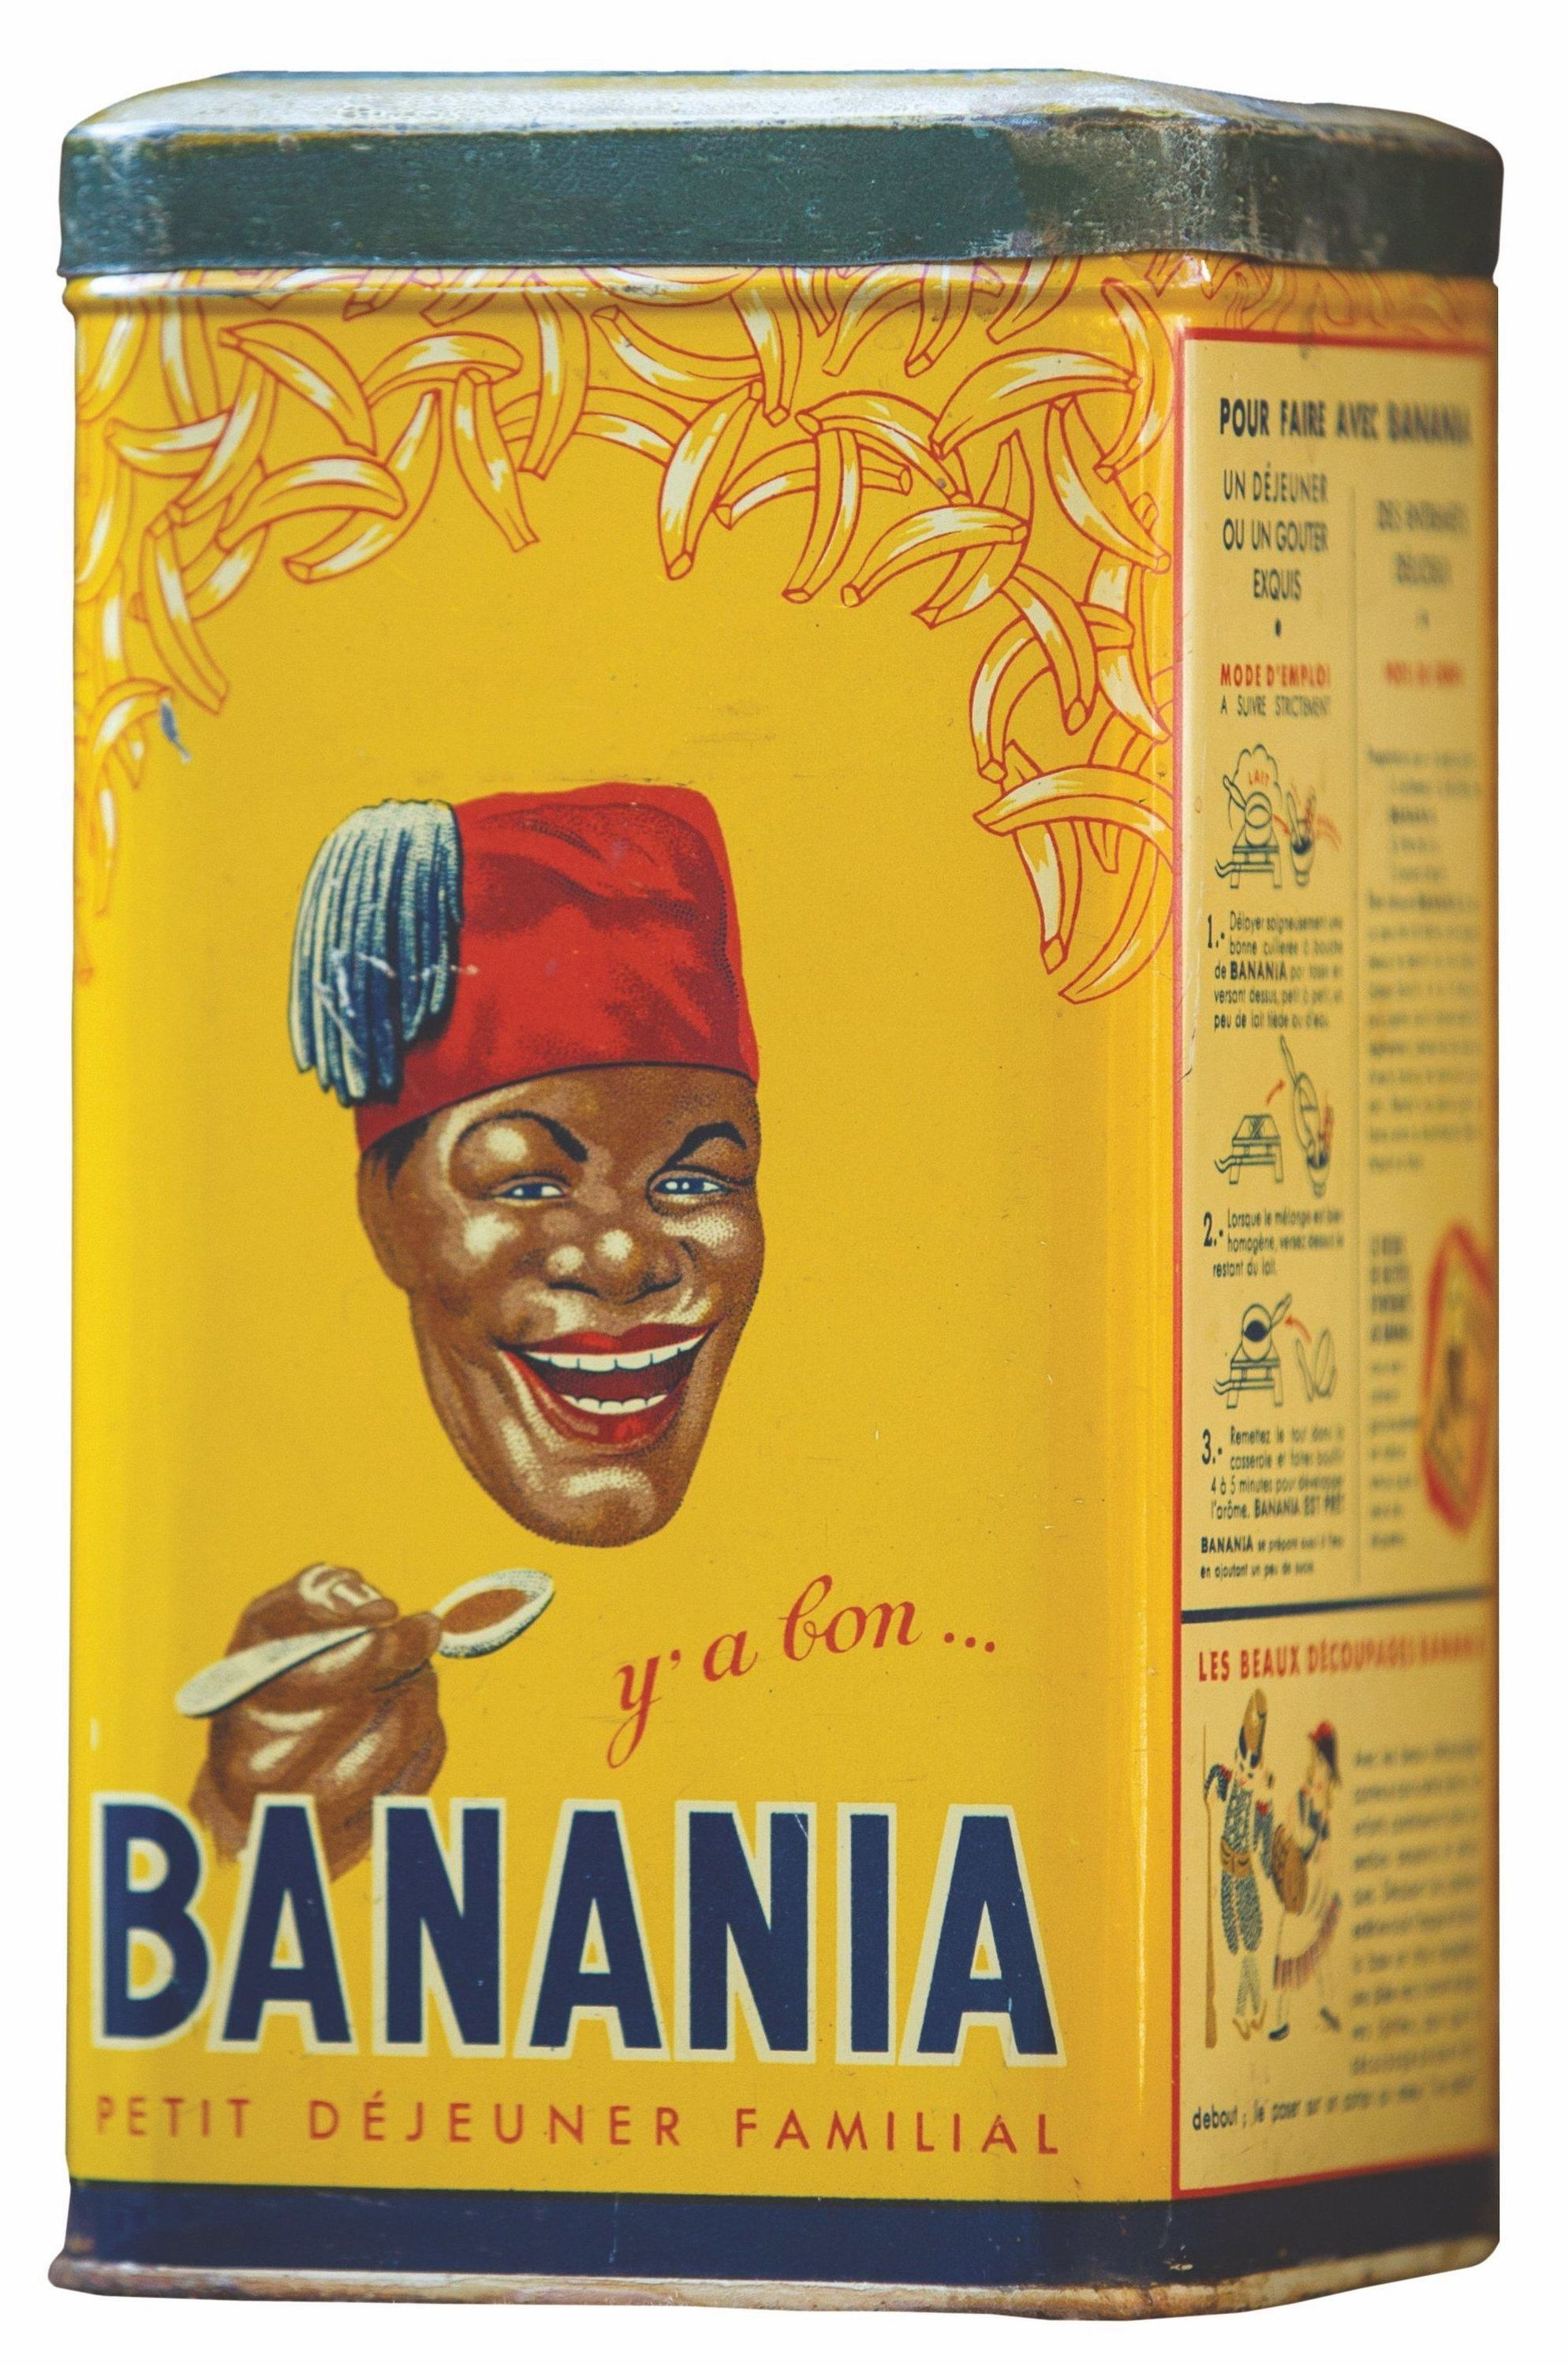 La boisson chocolatée Banania